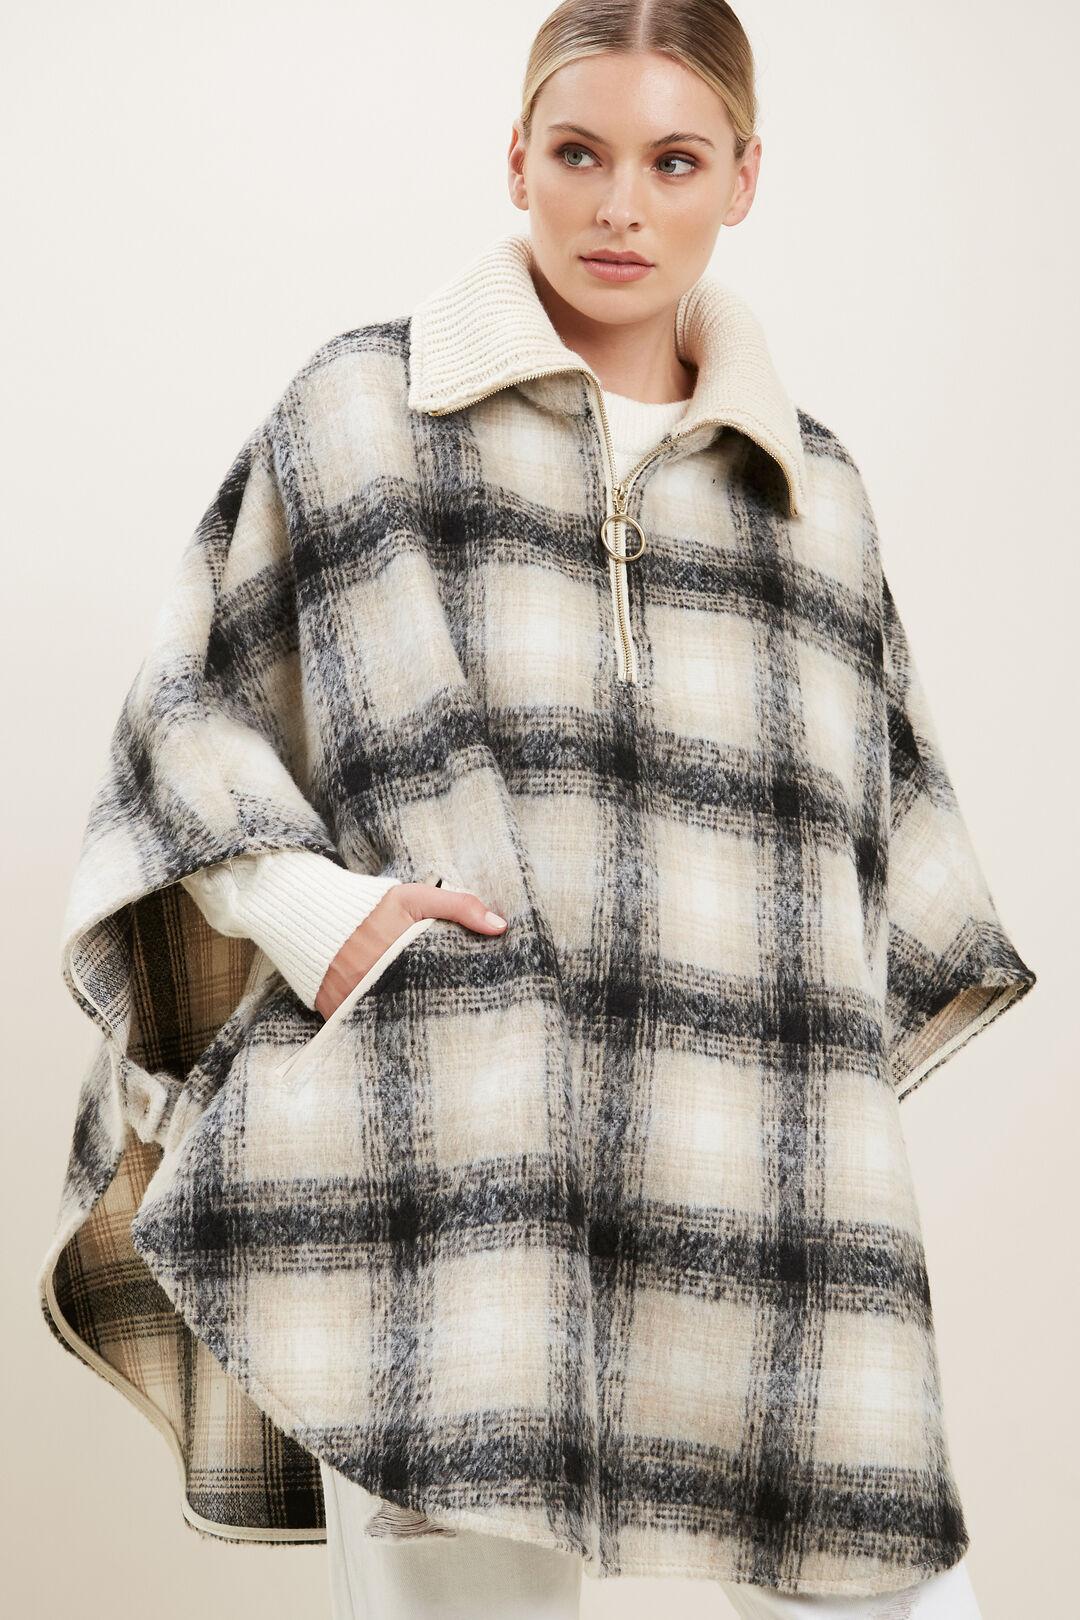 Wool Check Poncho  Cloud Cream Multi  hi-res